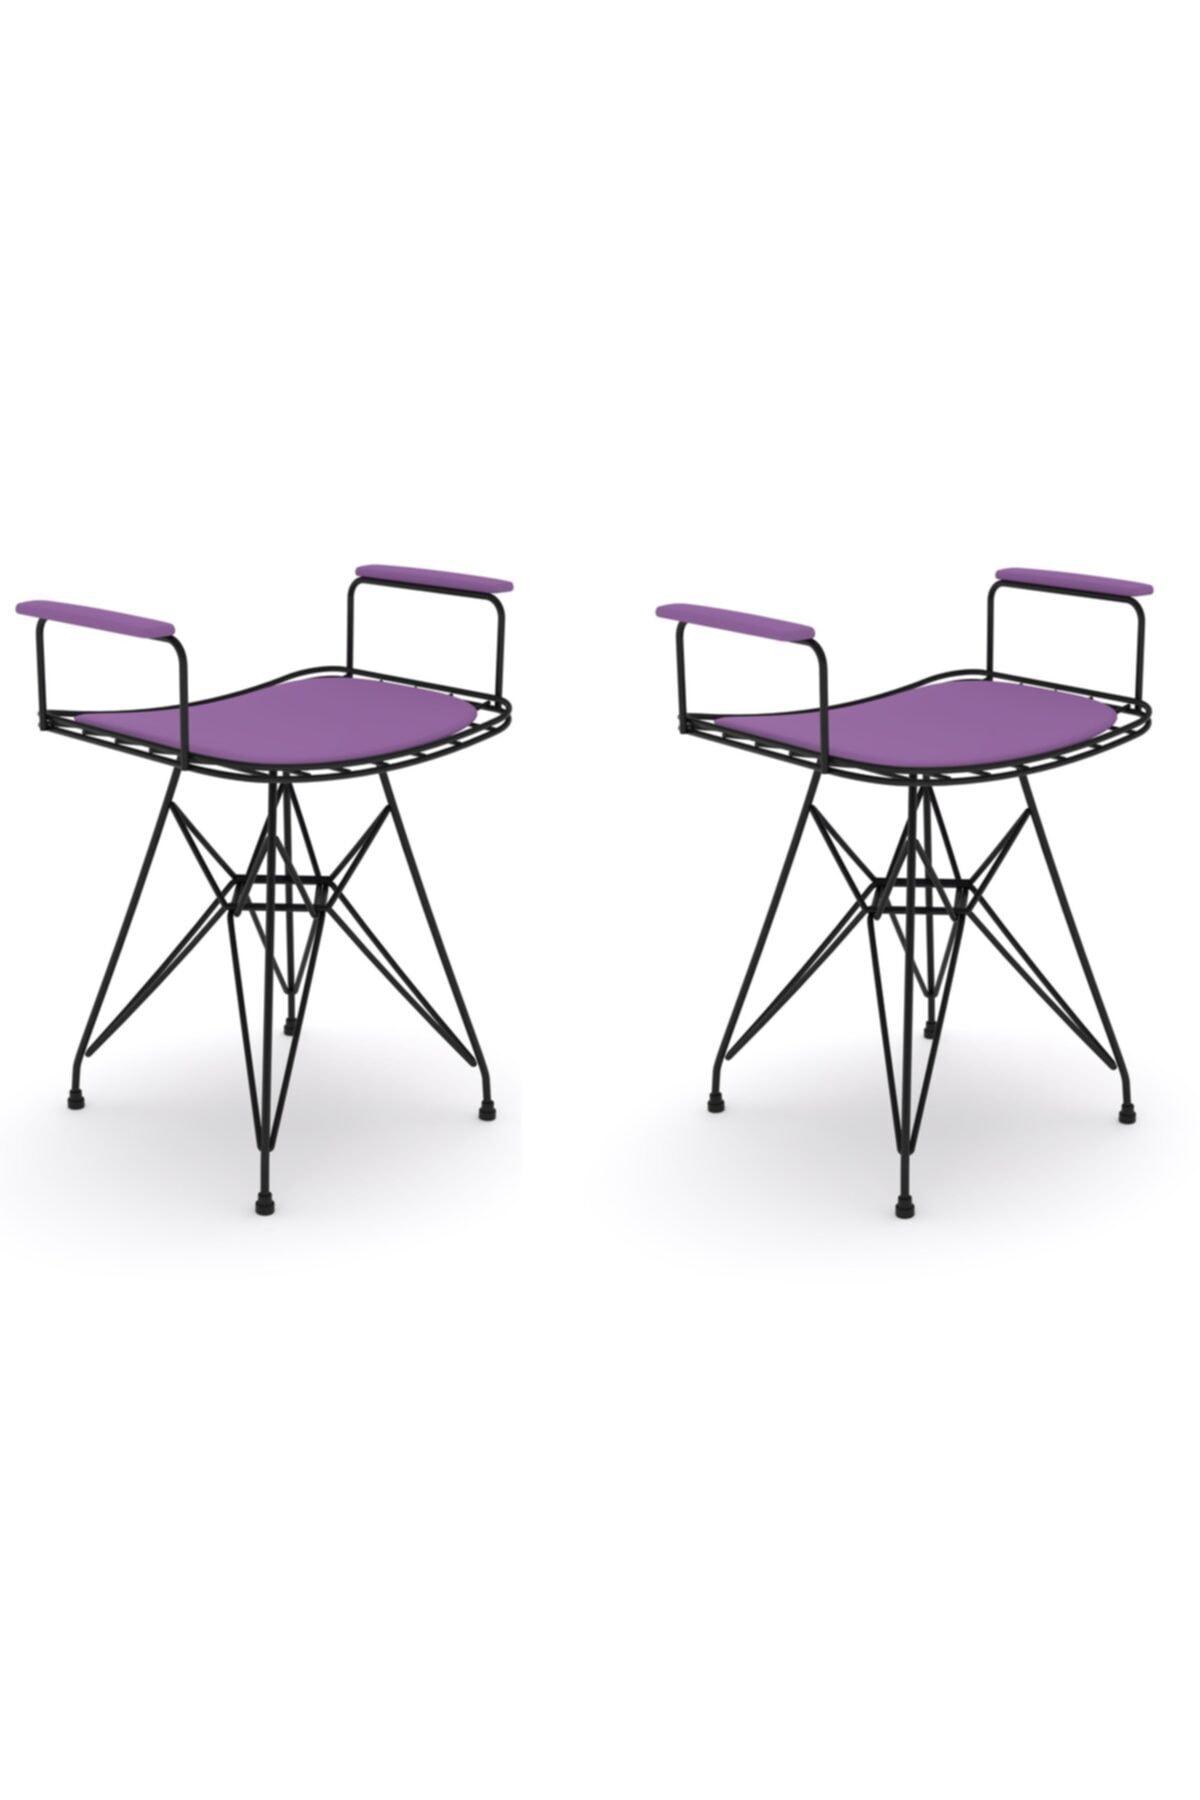 Knsz Kafes Tel Sandalyesi Tabure 2 Li Mutlu Syhmor Kolçaklı Ofis Cafe Bahçe Mutfak